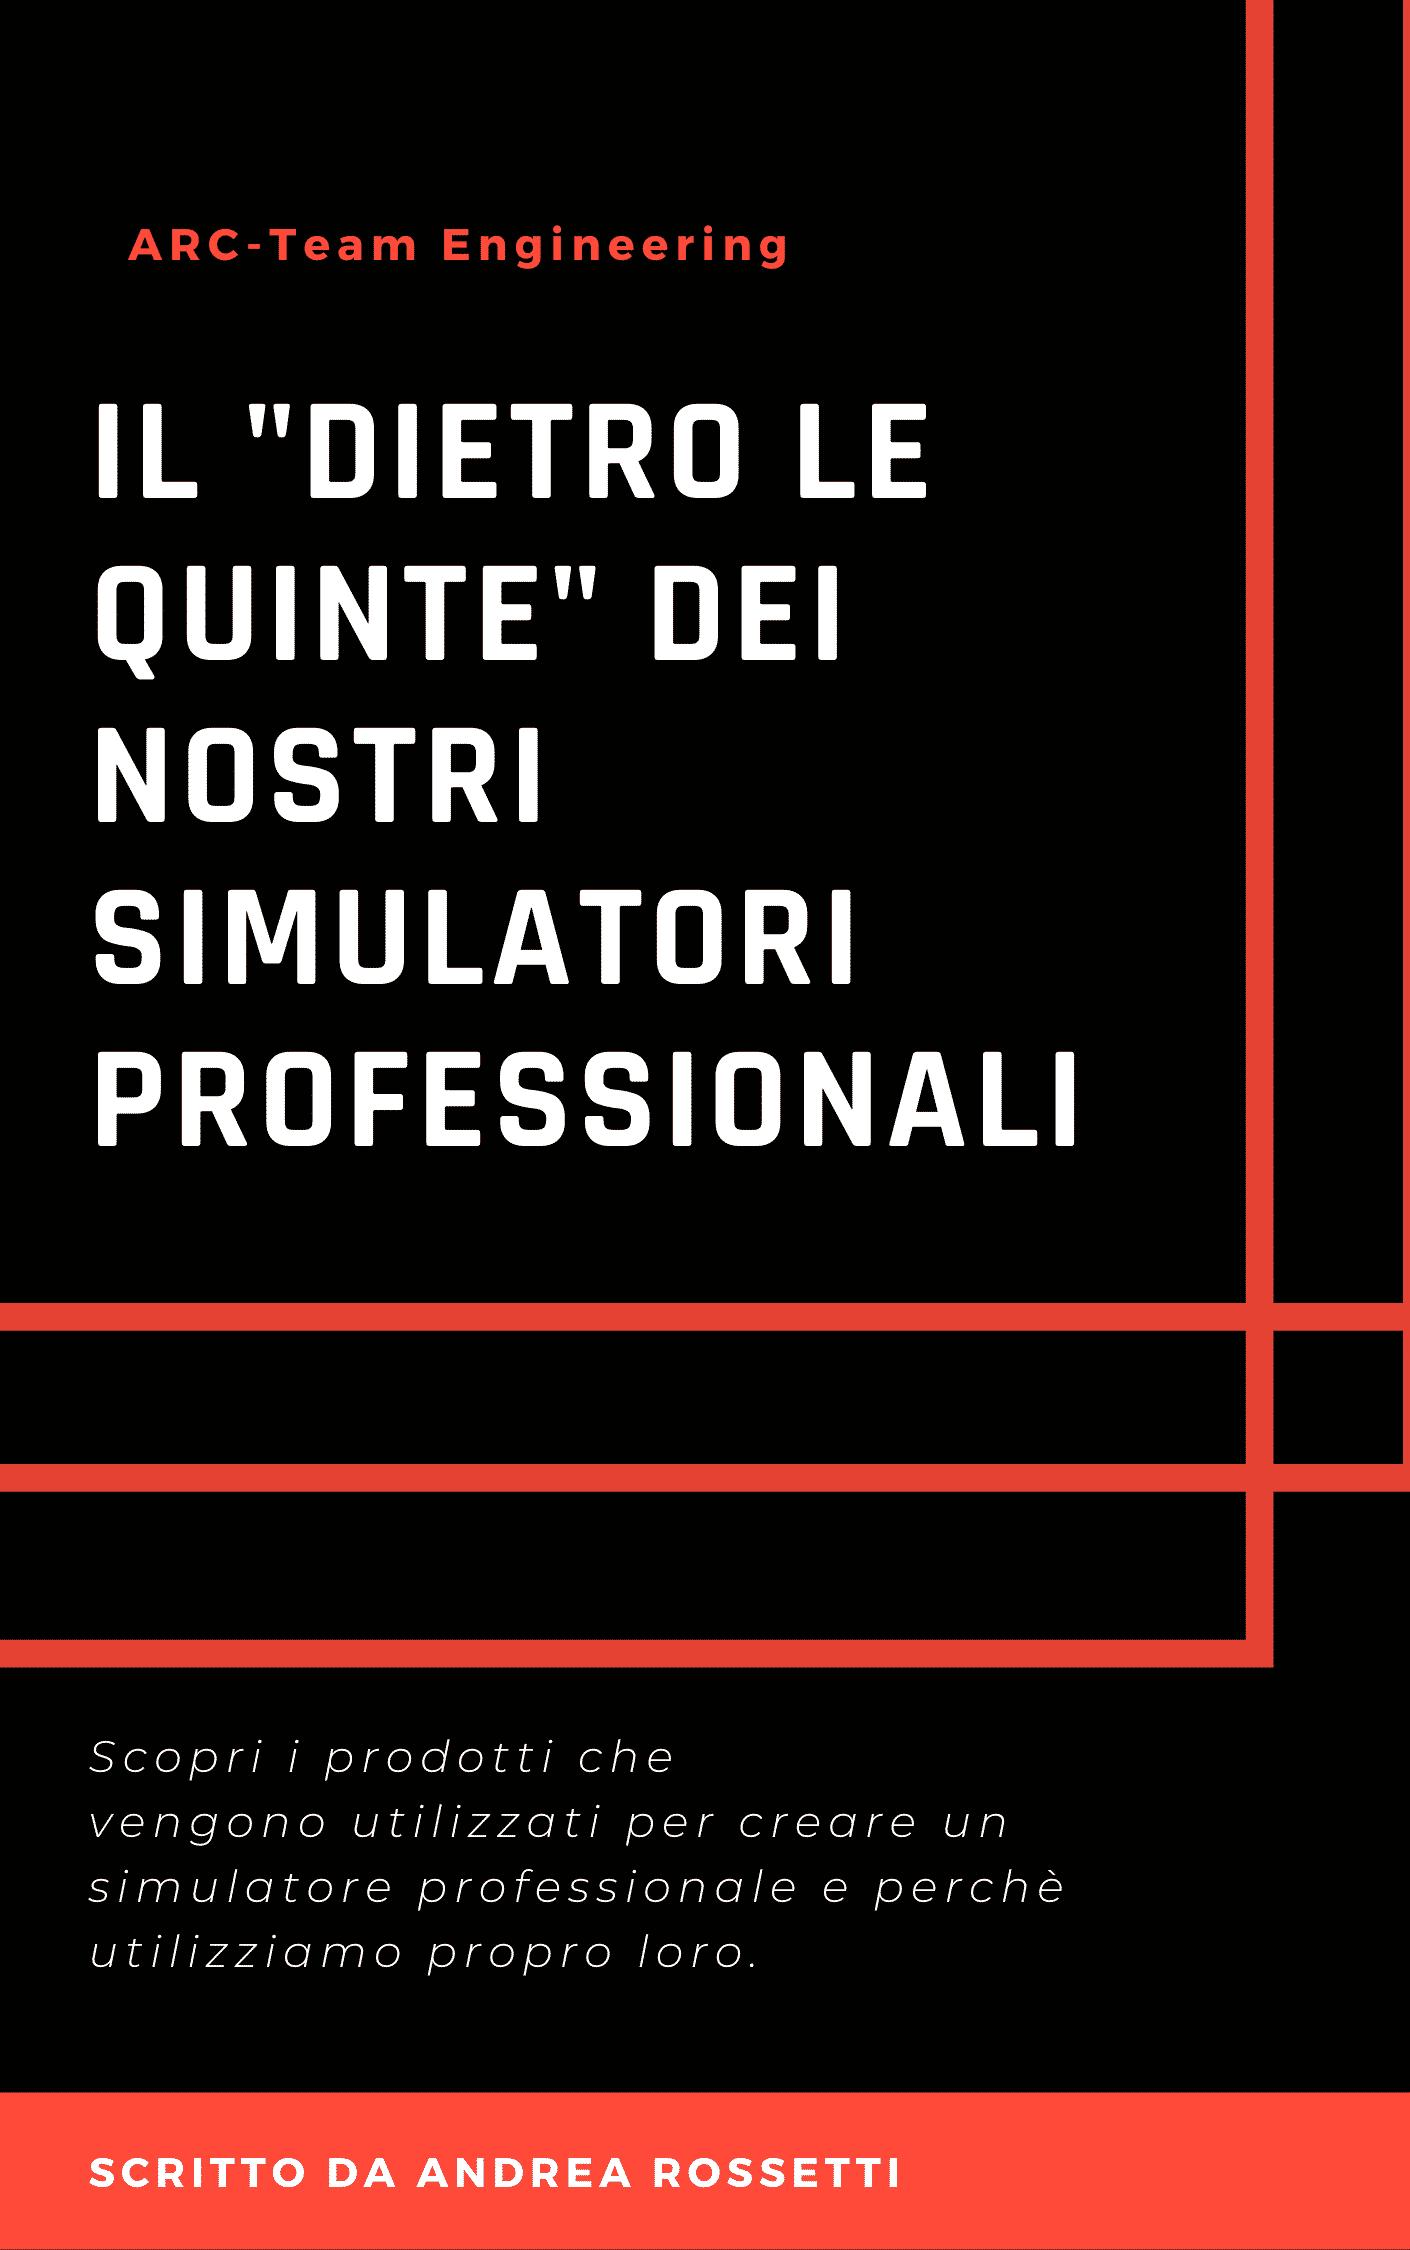 copertina brochure simulatori professionali